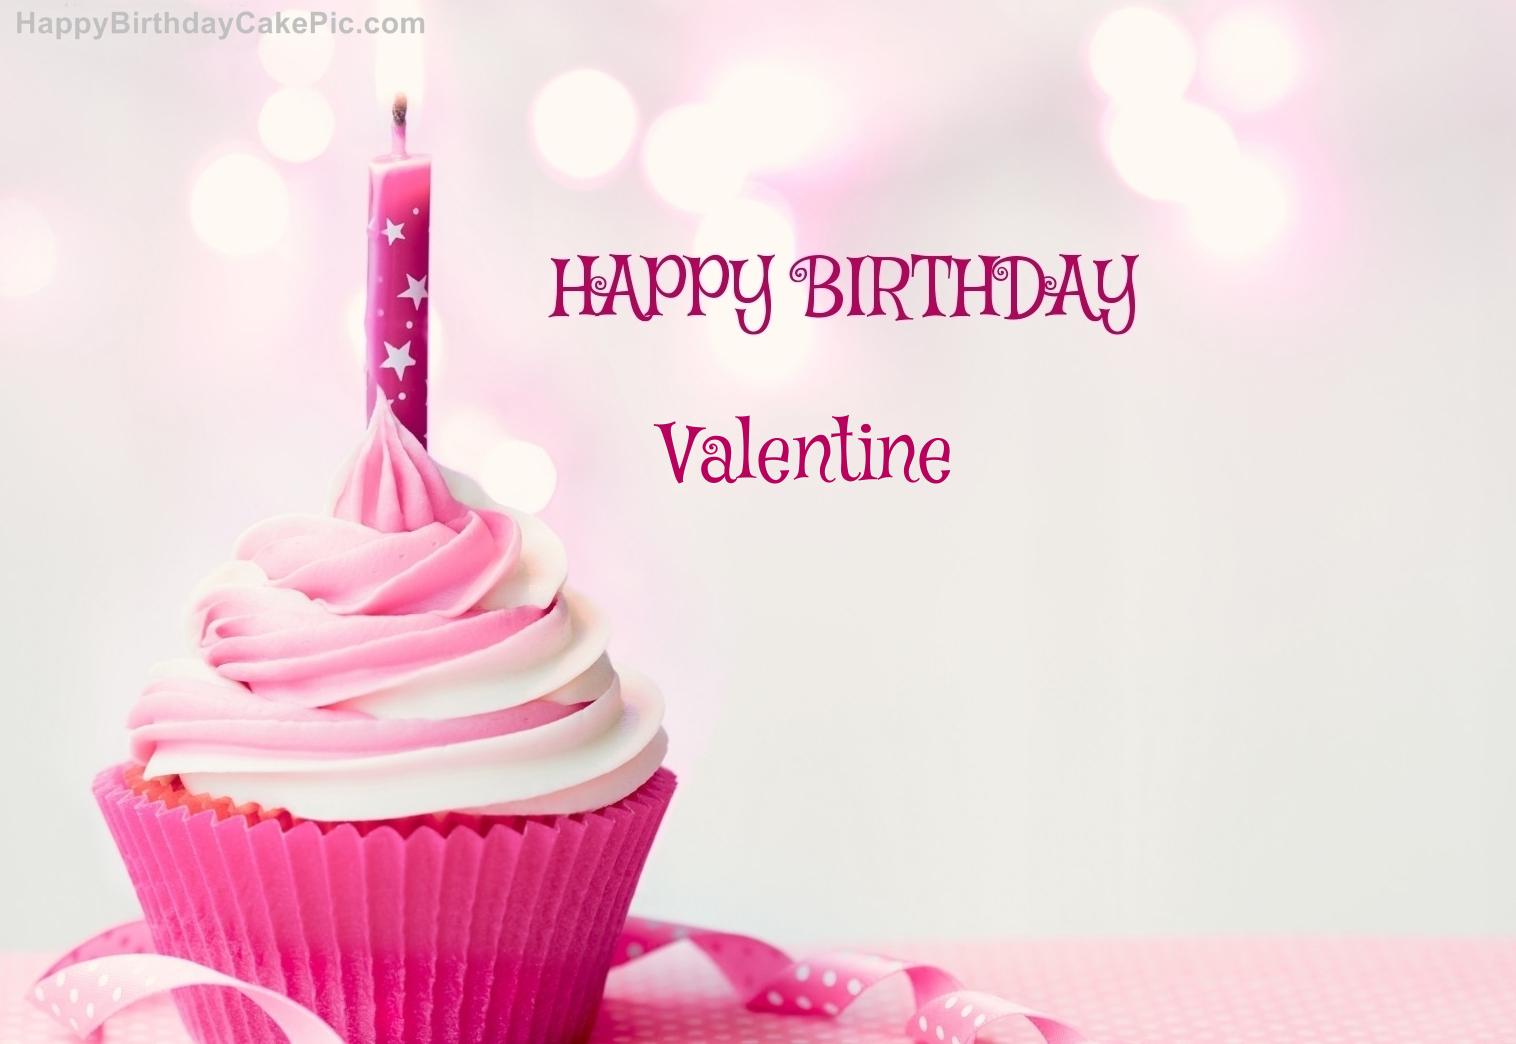 Perfekt Write Name On Happy Birthday Cupcake Candle Pink Cake